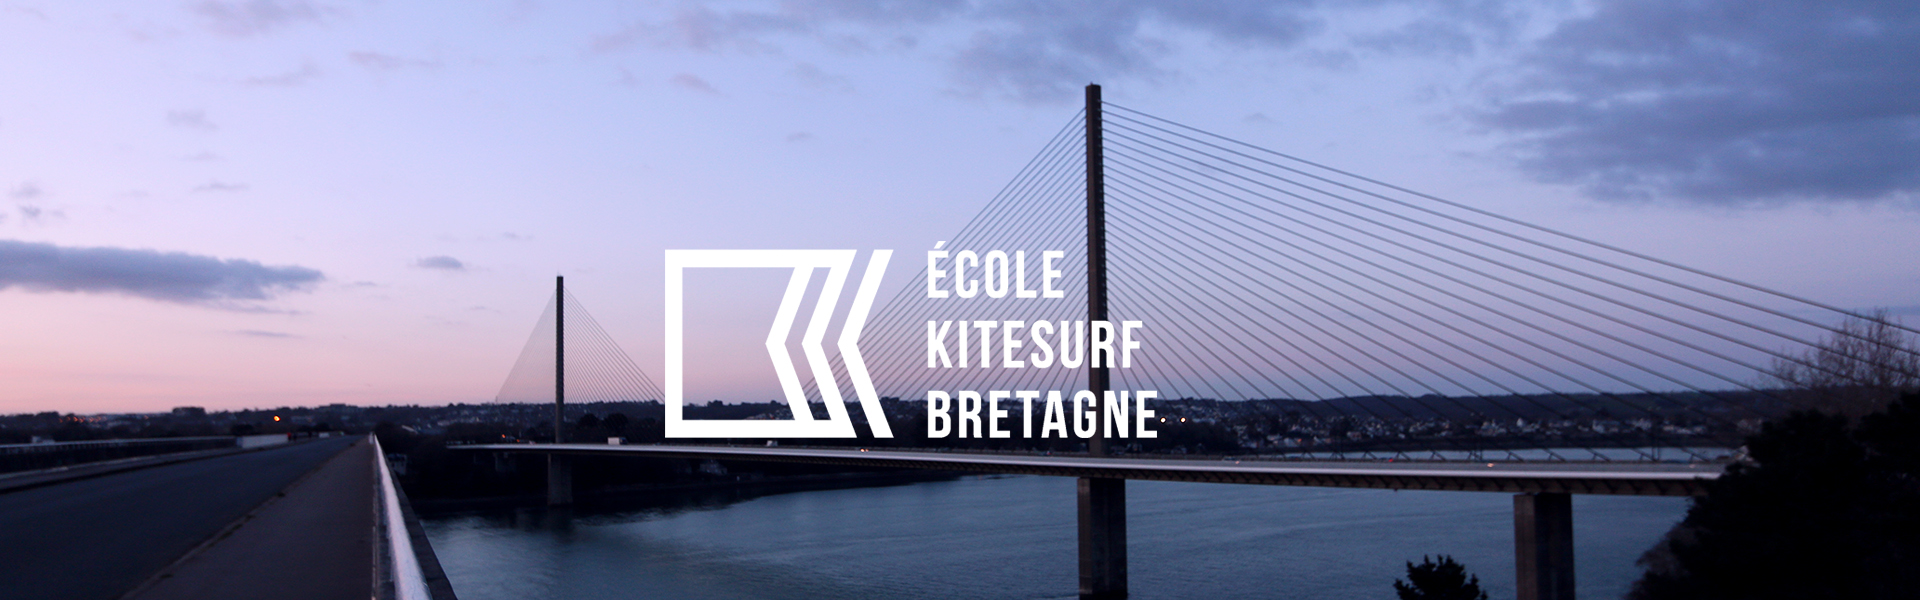 Ecole Kitesurf Bretagne Finistère Brest